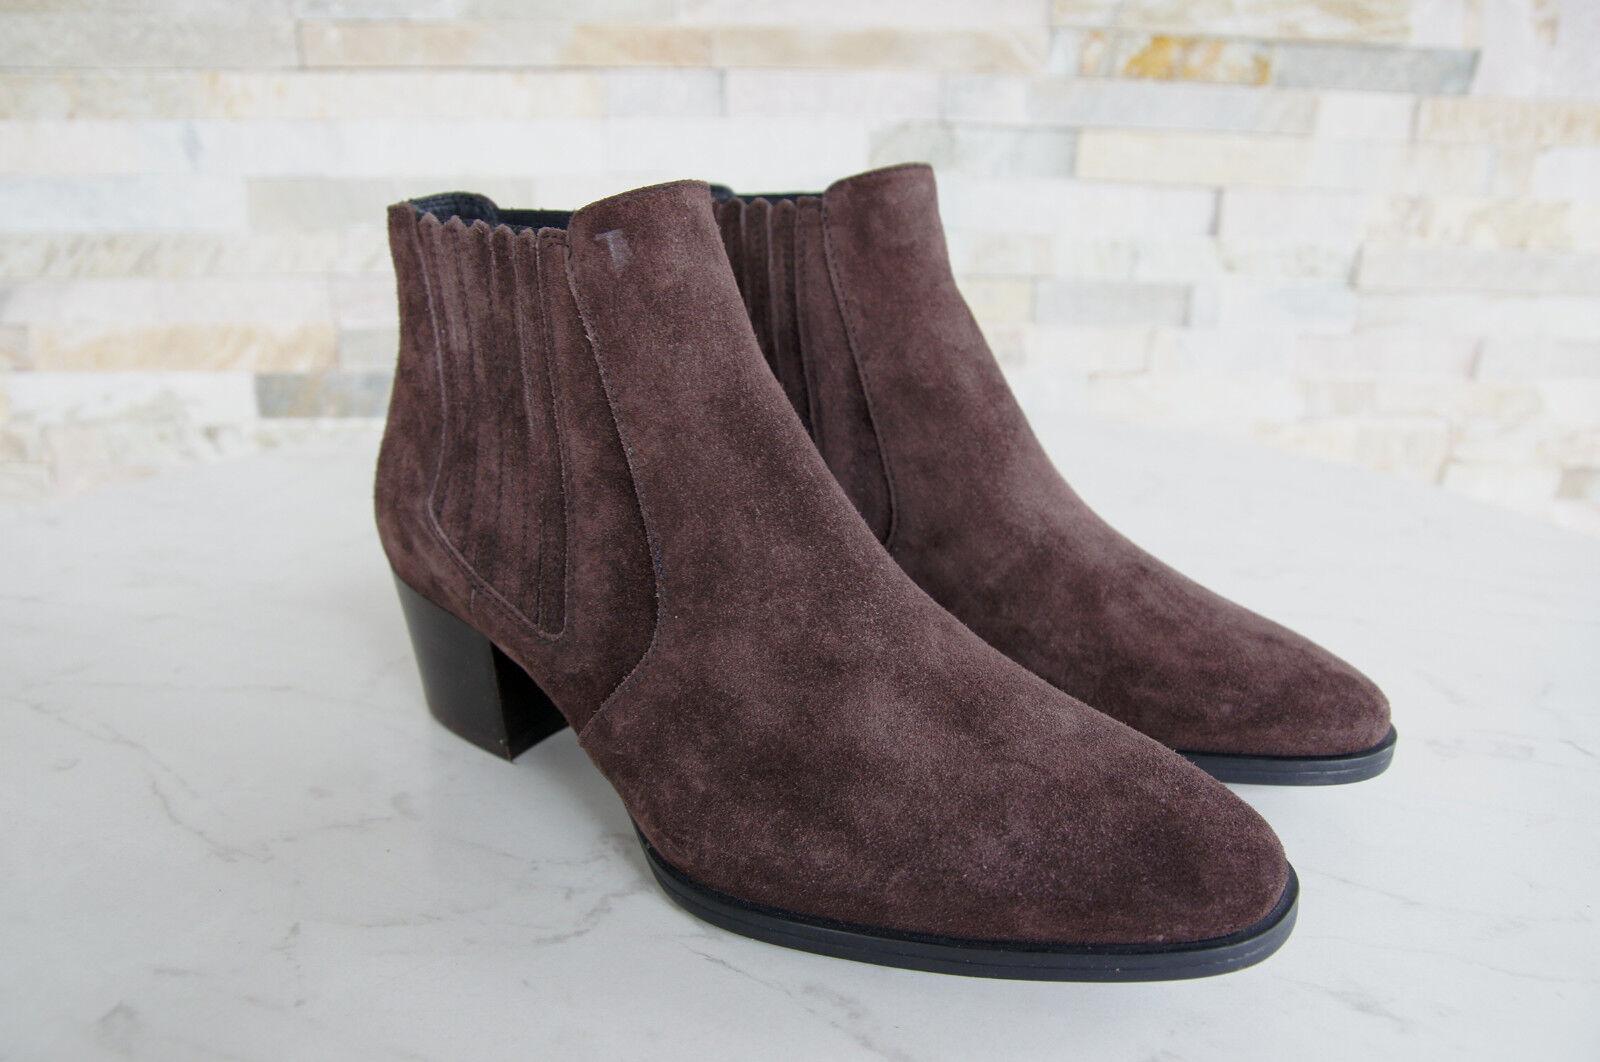 Tods Tod´s Stiefeletten Stiefeletten Stiefeletten 36,5 Ankle Stiefelies Stiefel Schuhe braun neu ehem  8edd4c